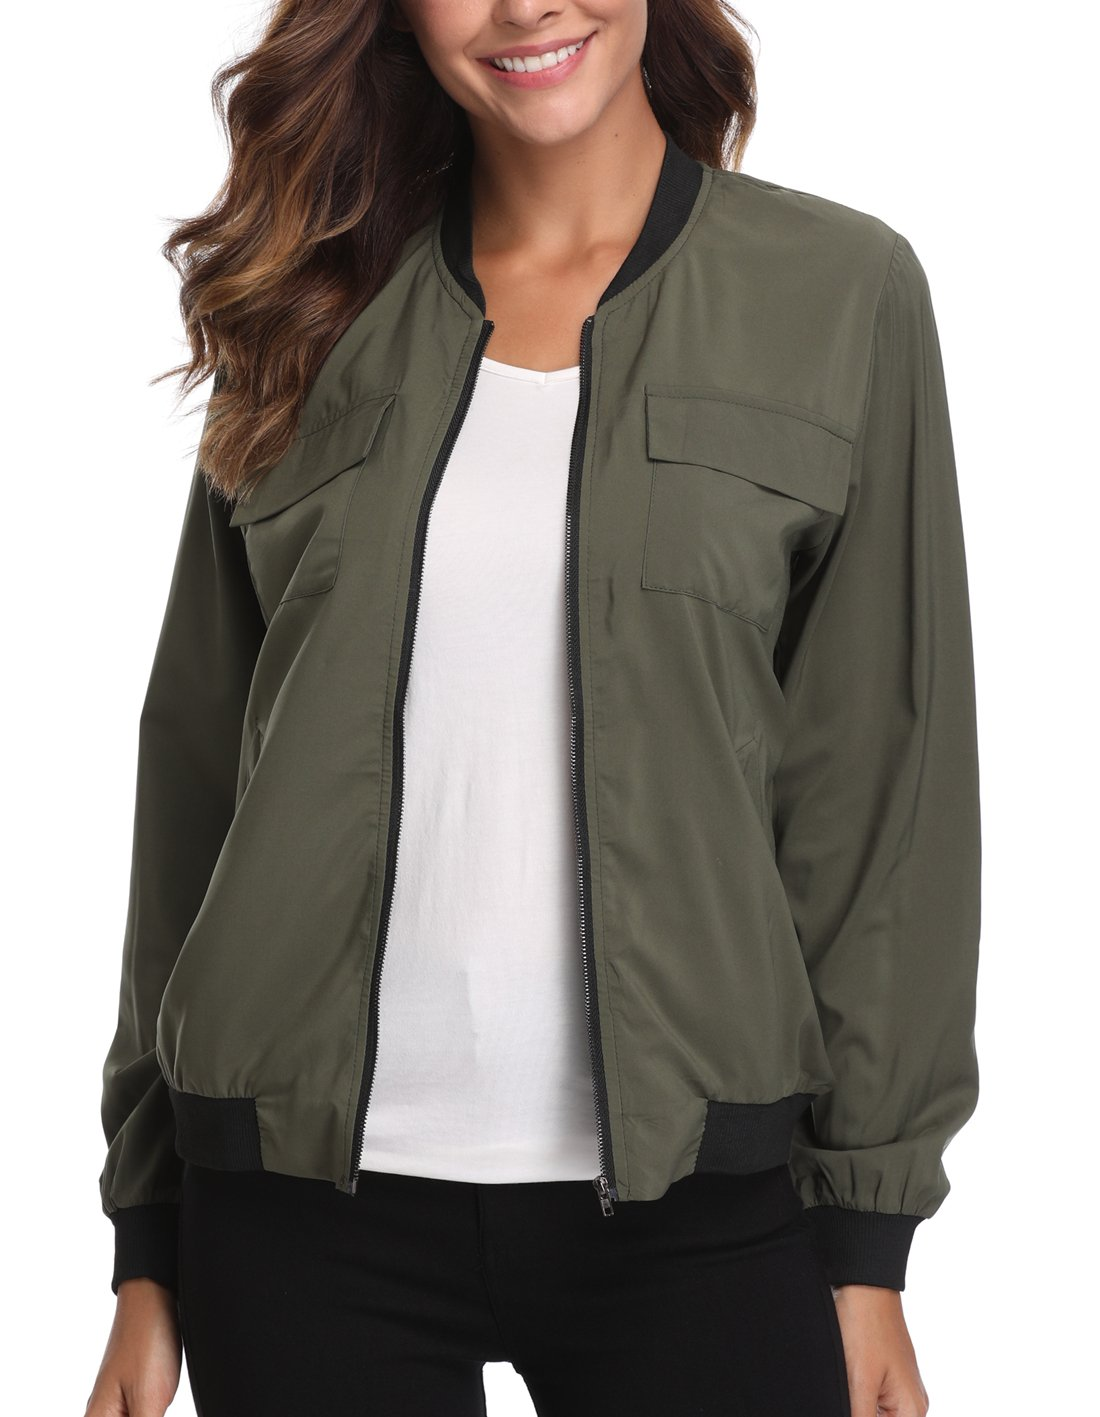 MISS MOLY Jacket for Women Lightweight Zip up Coat Rib Collar Windbreaker Bomber Outwear